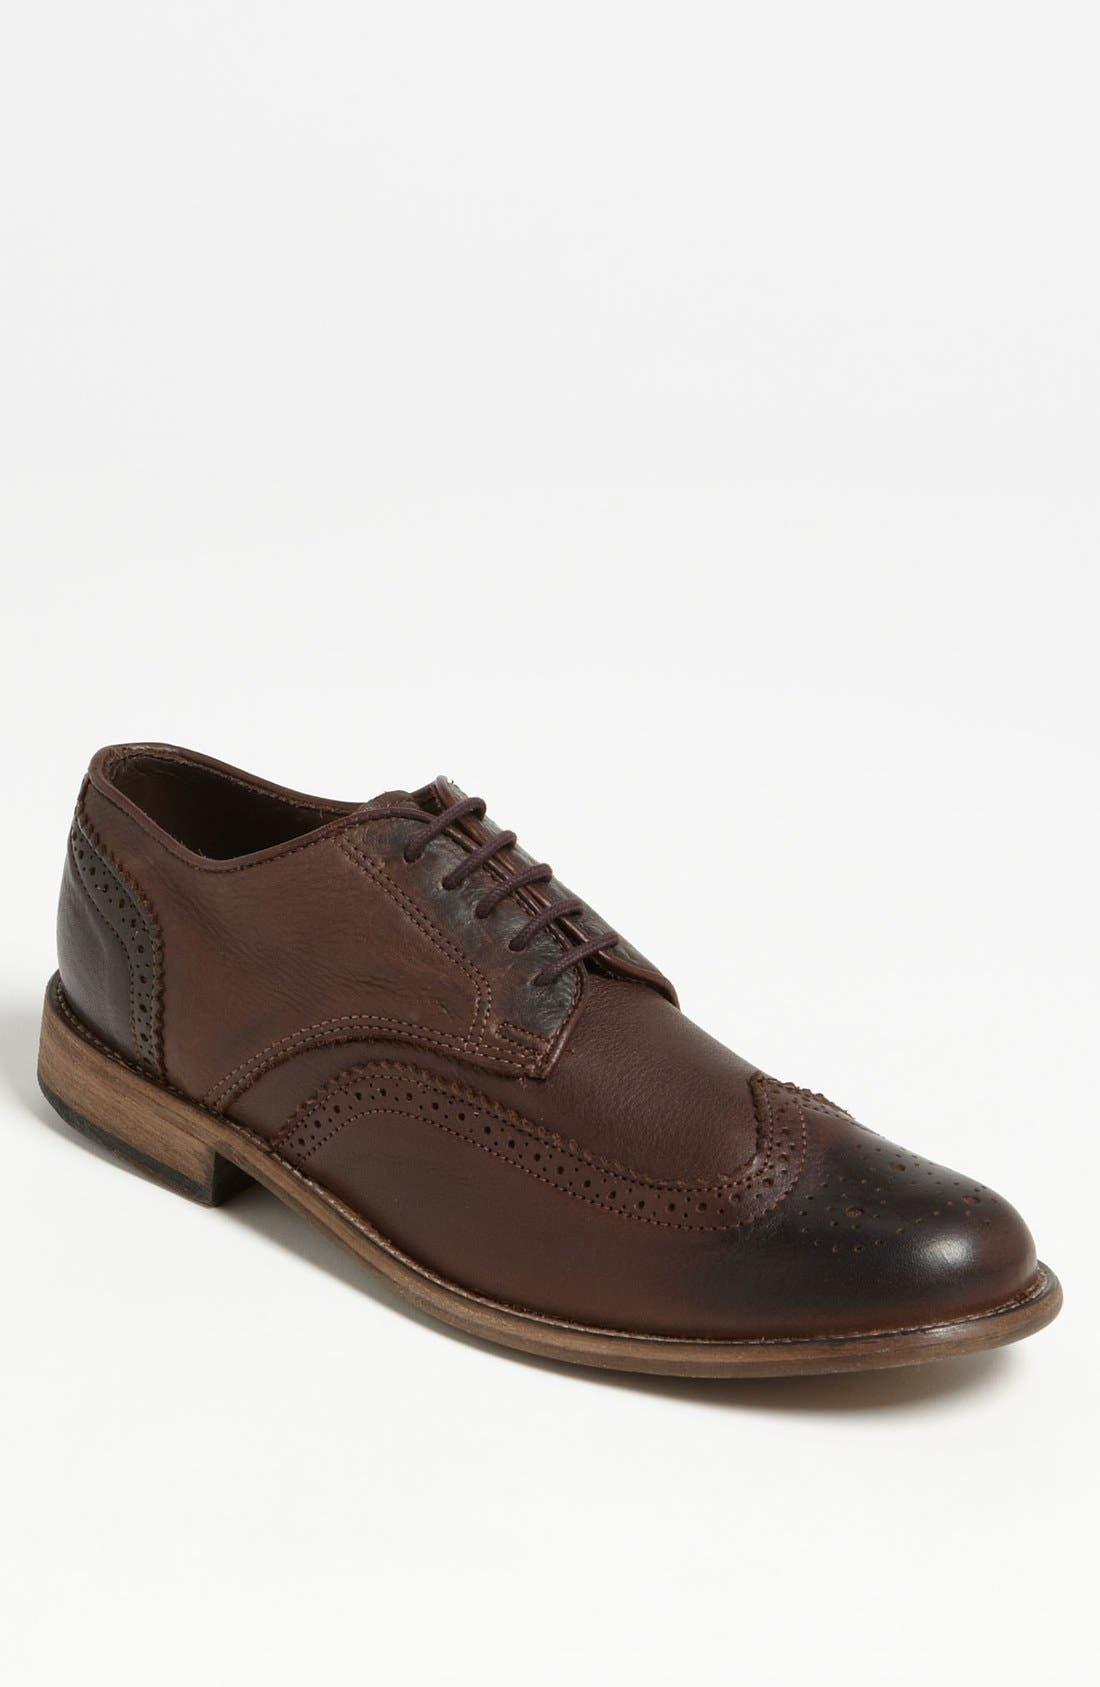 Alternate Image 1 Selected - Vintage Shoe Company 'Warren' Wingtip